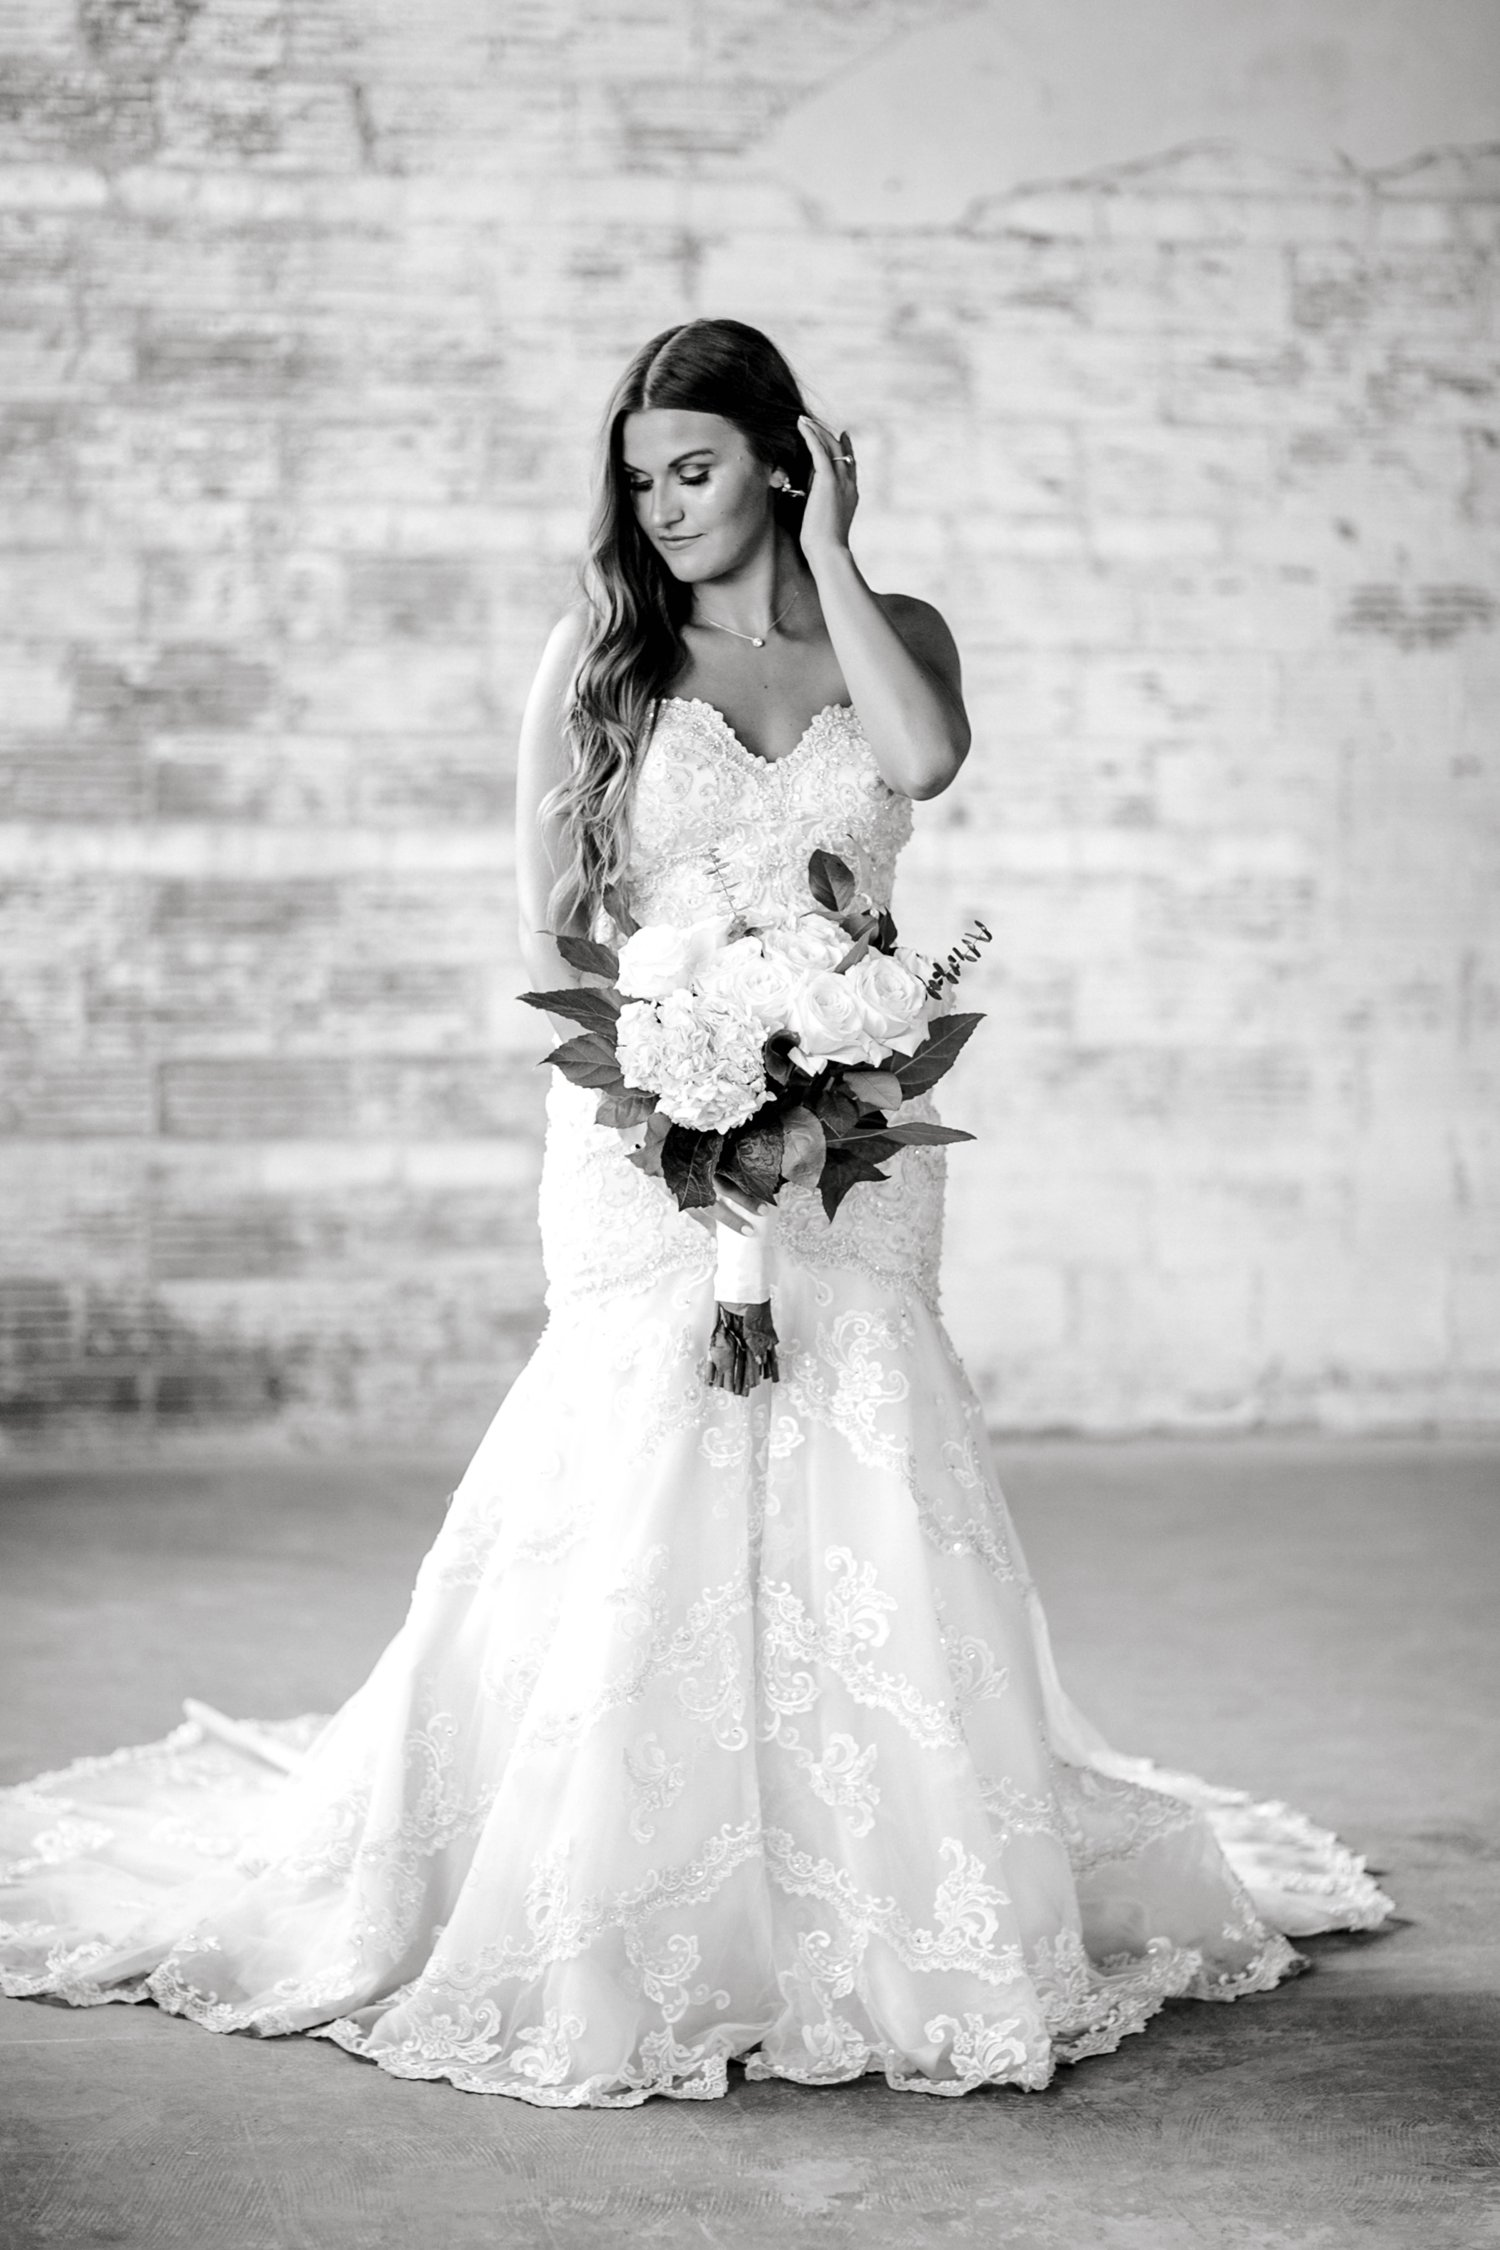 Kendra_Hill_Bridals_ALLEEJ_Lubbock_Wedding_Photographer_LHUCA_0003.jpg